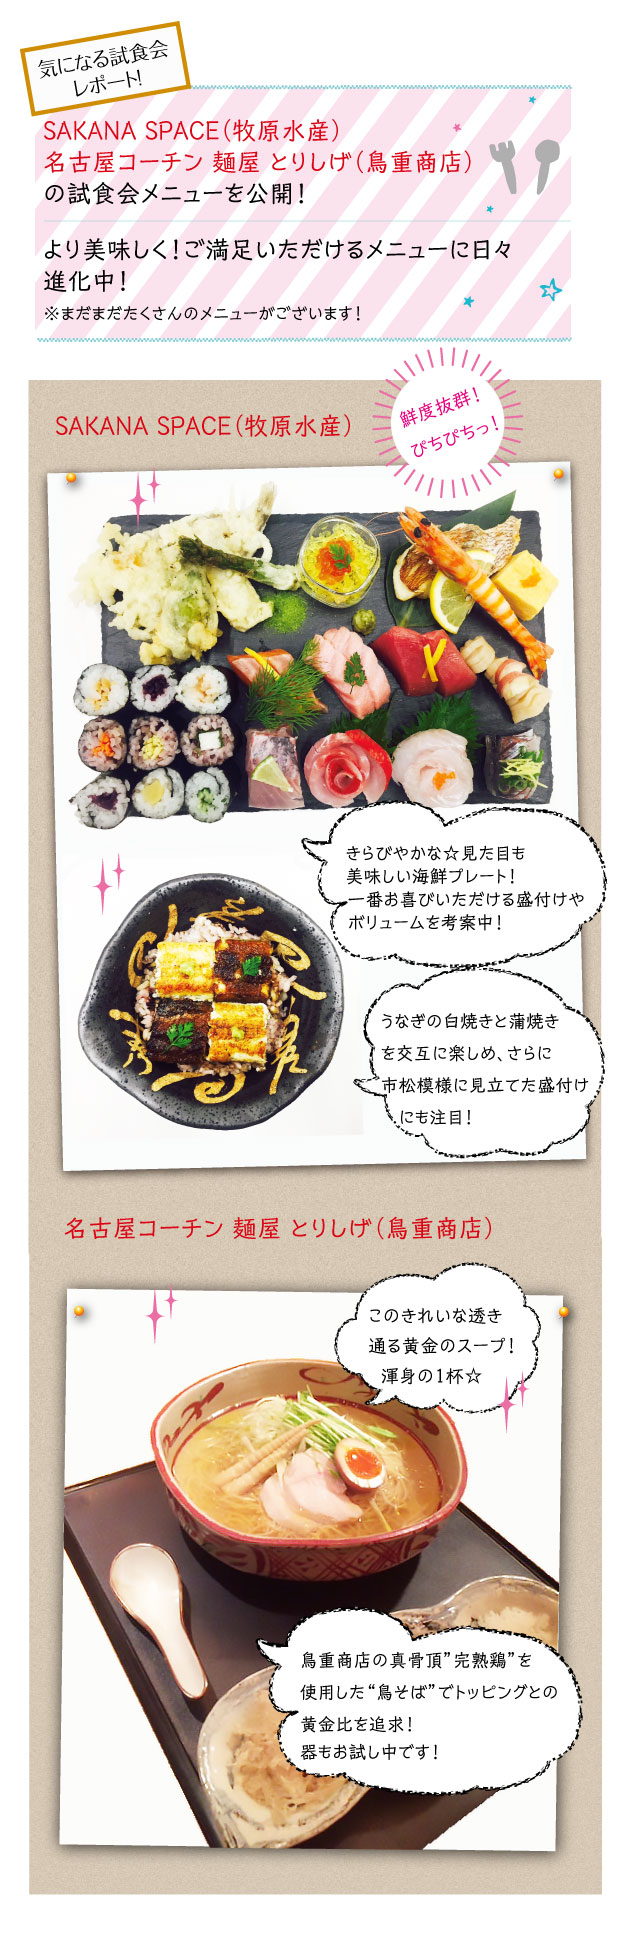 /data/project/178/鳥しげ・牧原水産.jpg?1490821311